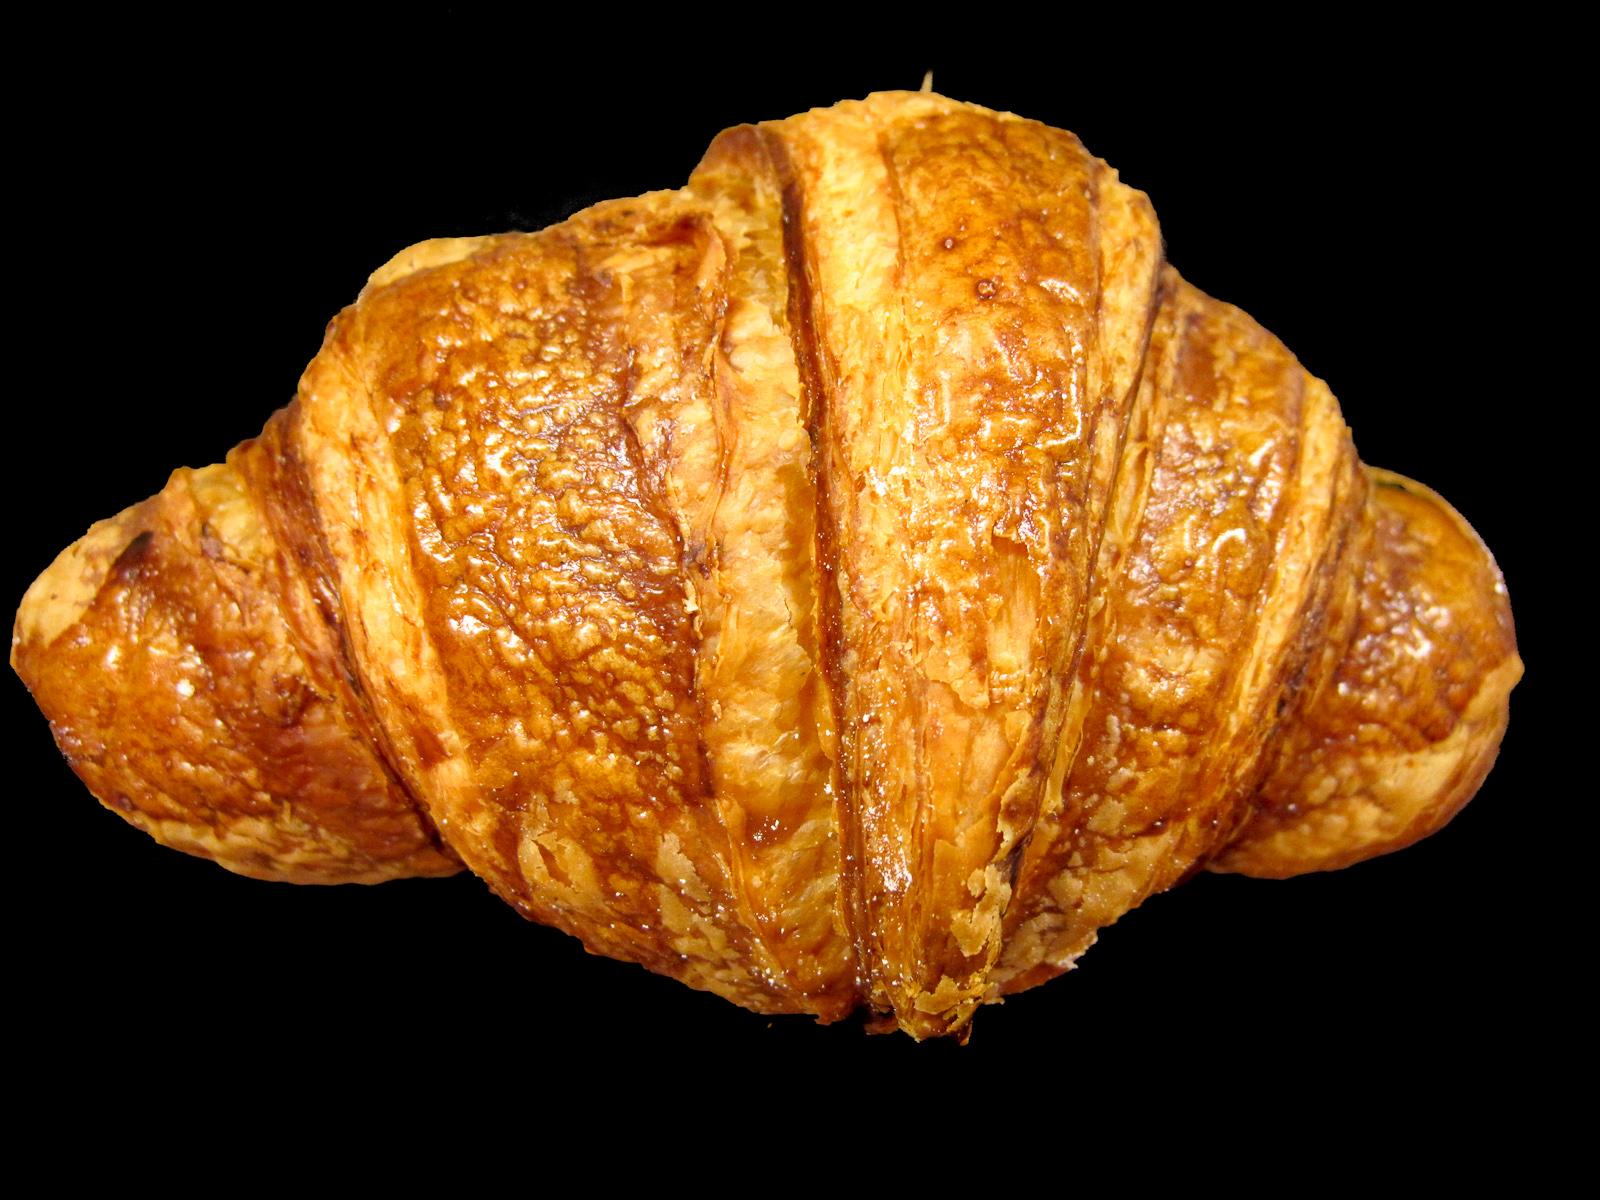 Laurent Duch�ne - Croissant Exterior